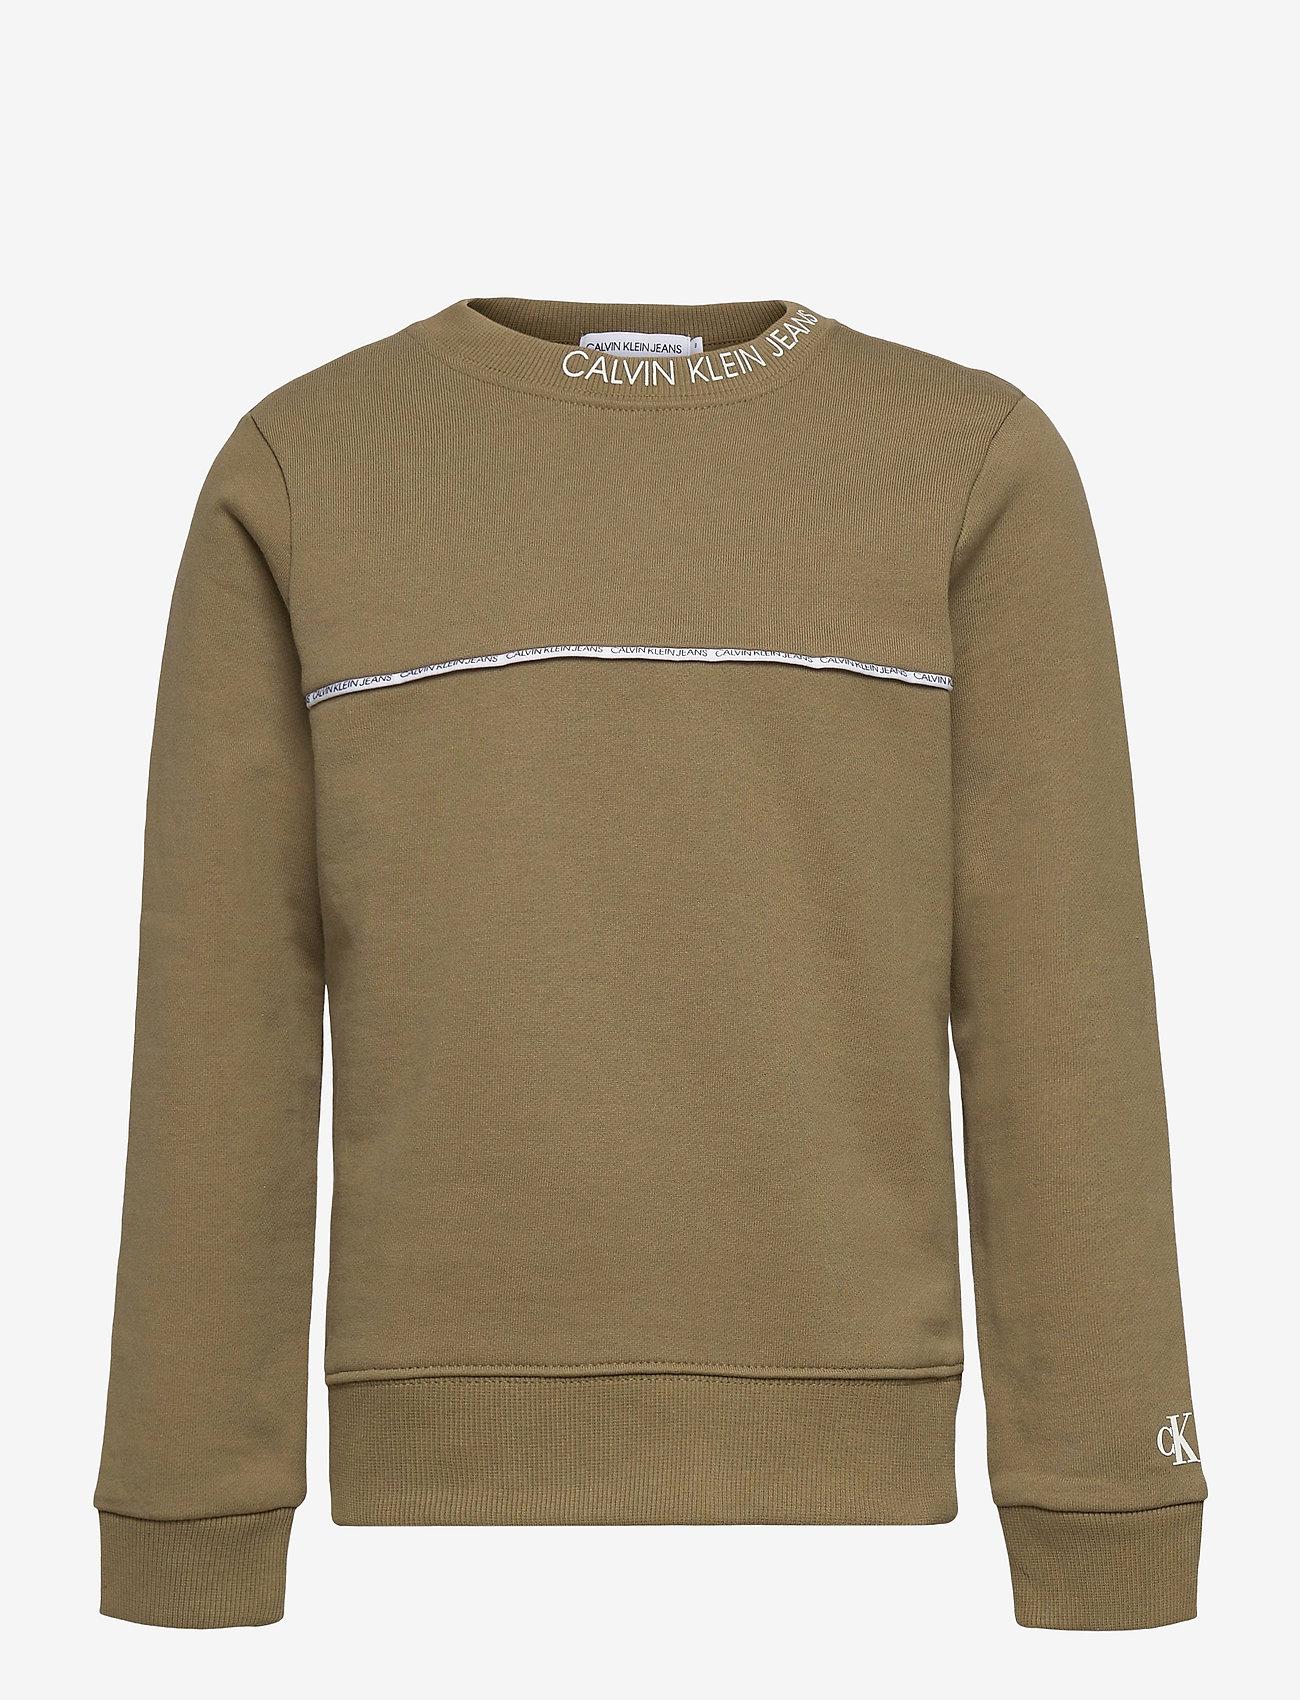 Calvin Klein - LOGO PIPING SWEATSHIRT - sweatshirts - olive khaki - 0